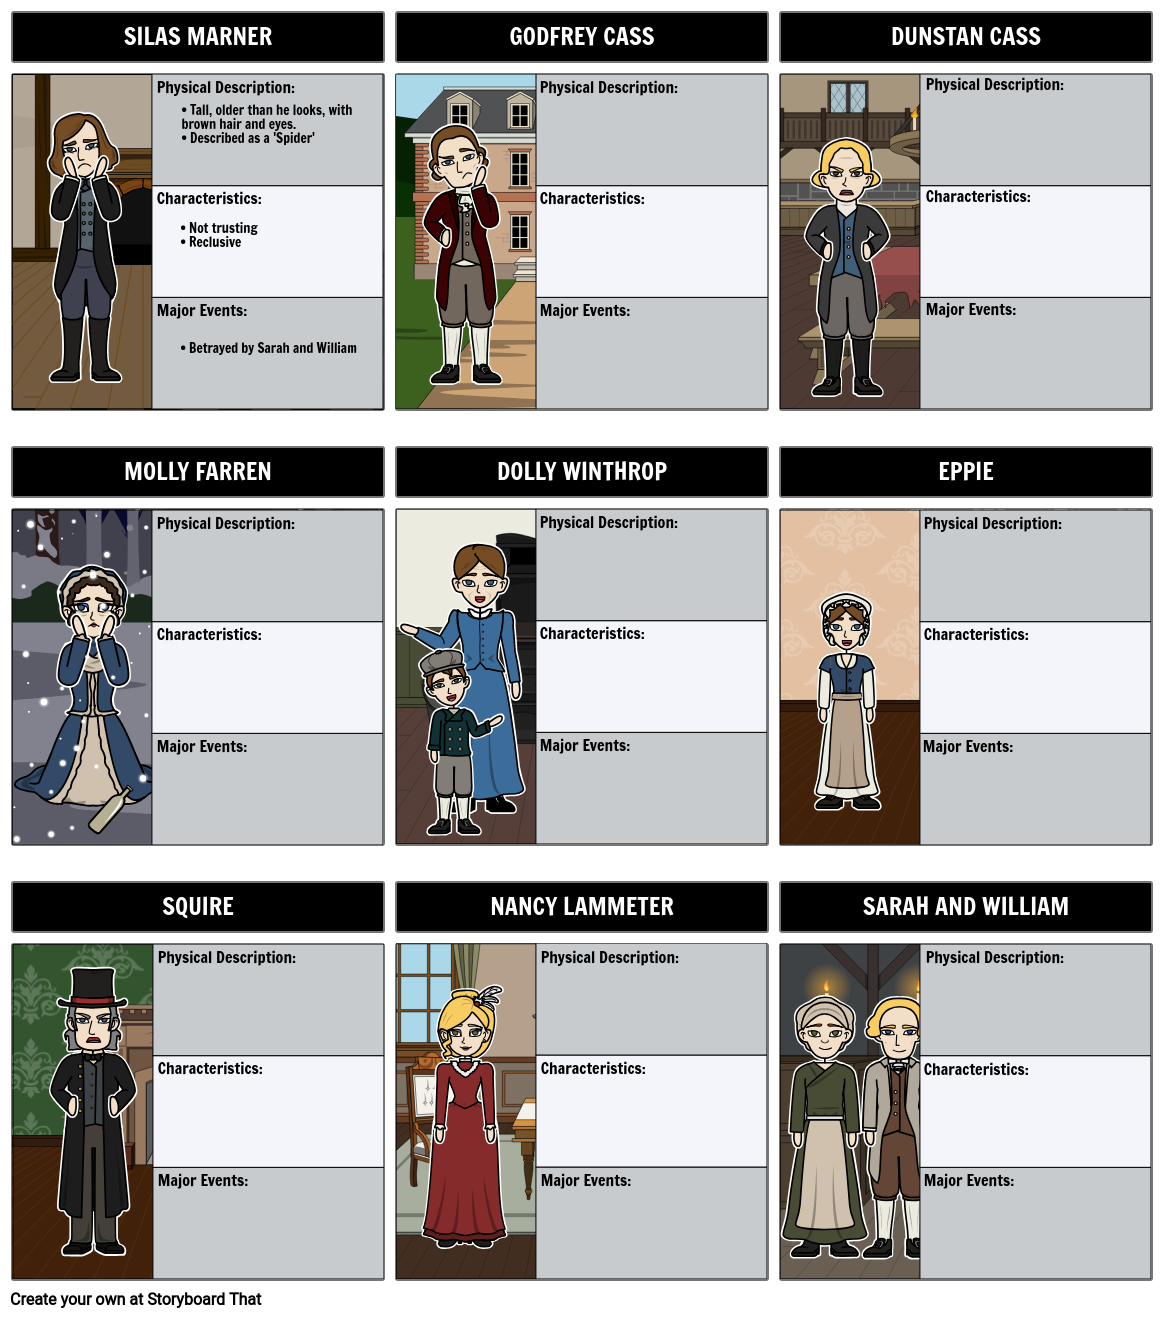 silas marner summary themes plot characters george eliot silas marner characters